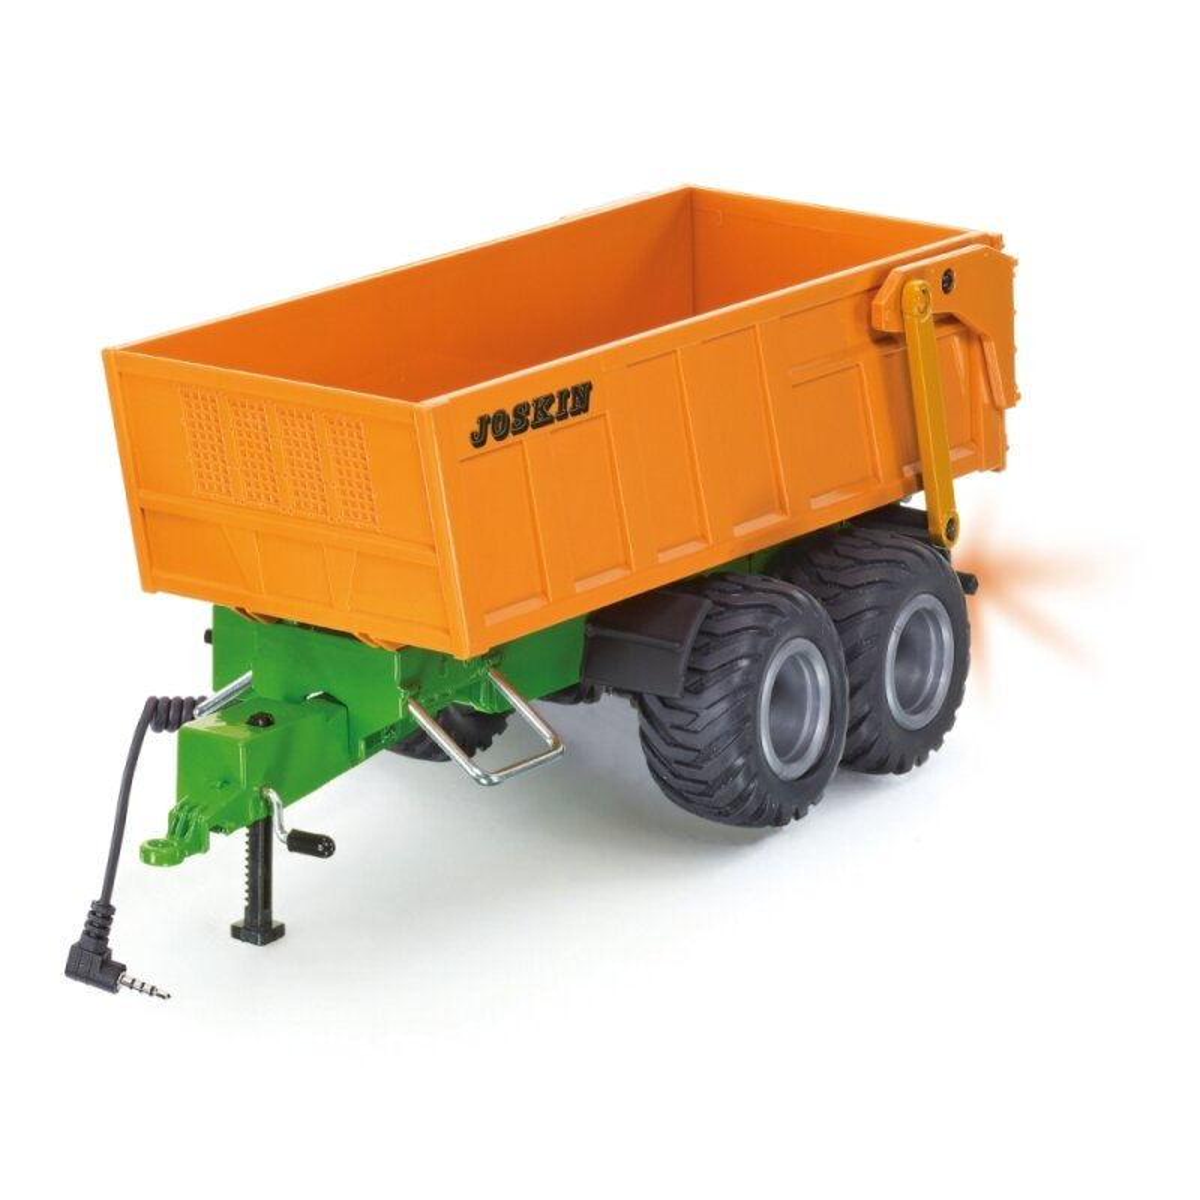 414 PORSCHE Traktor ? und Pflug Siku V Serie Kunststoff